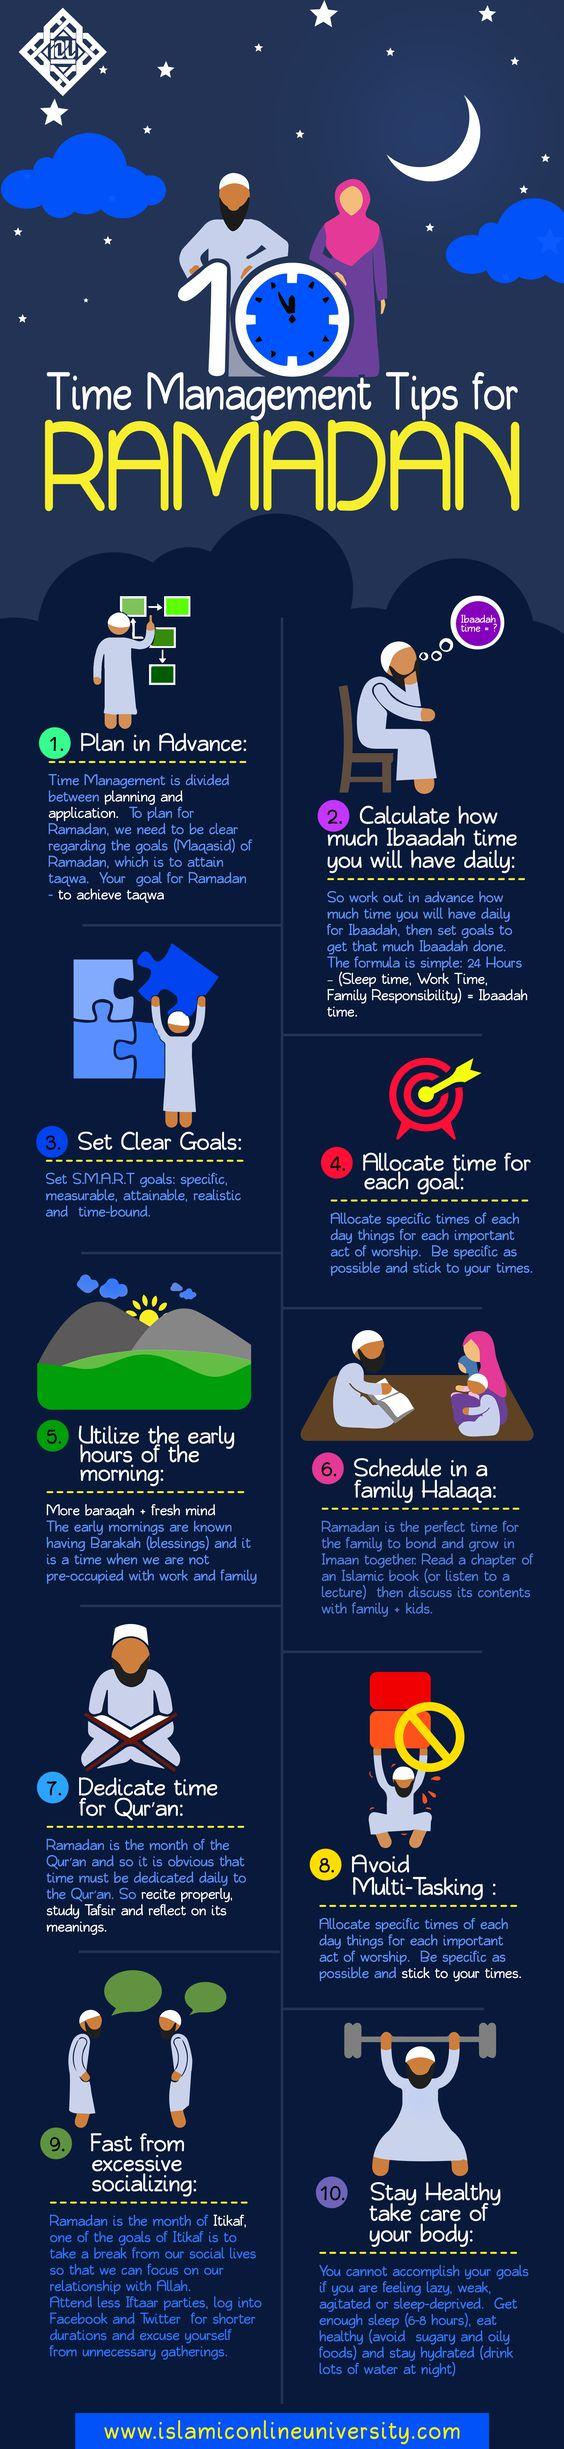 RamadanTips